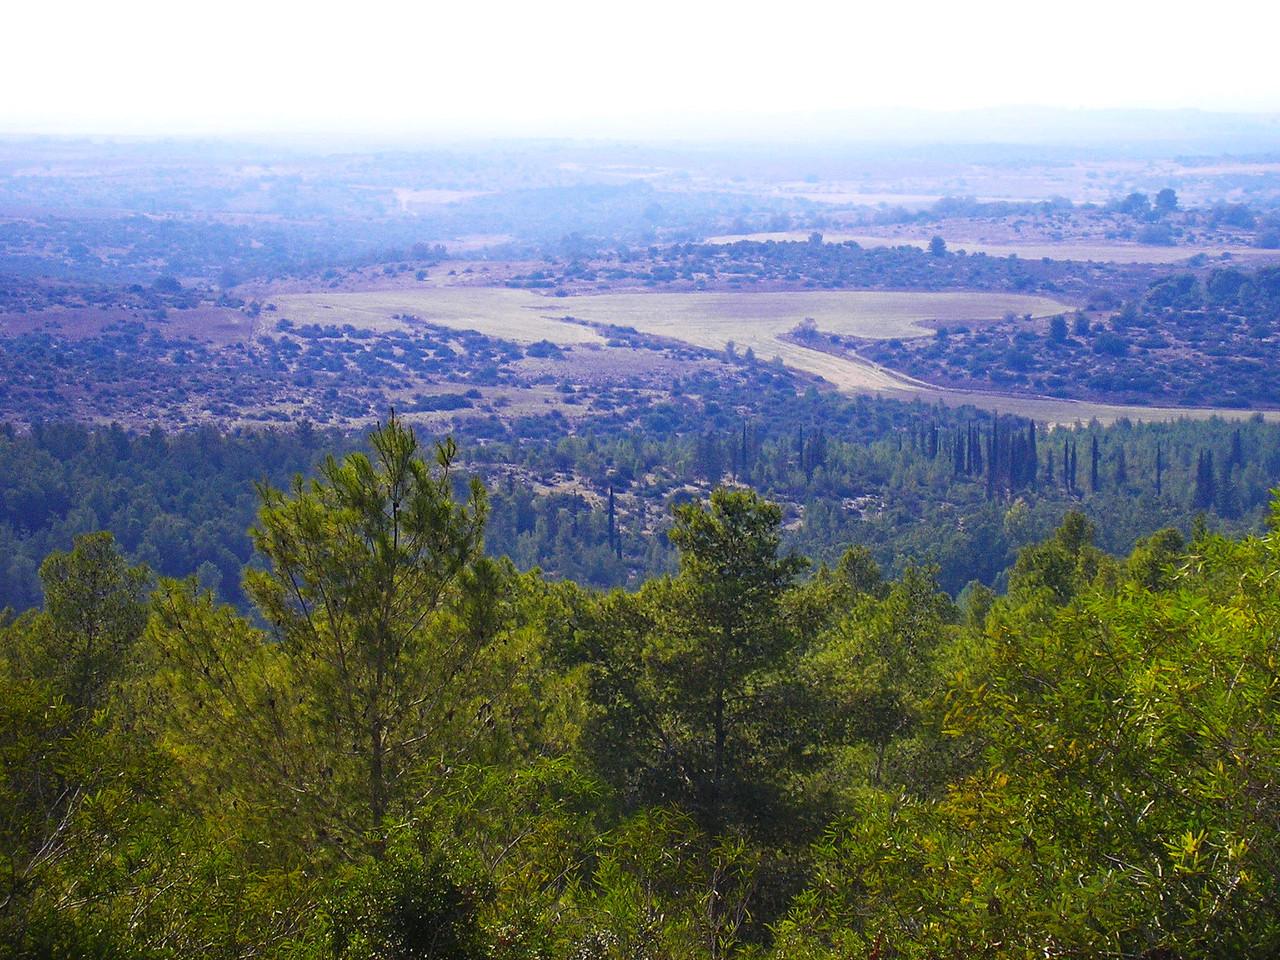 Beit Shemesh Valley